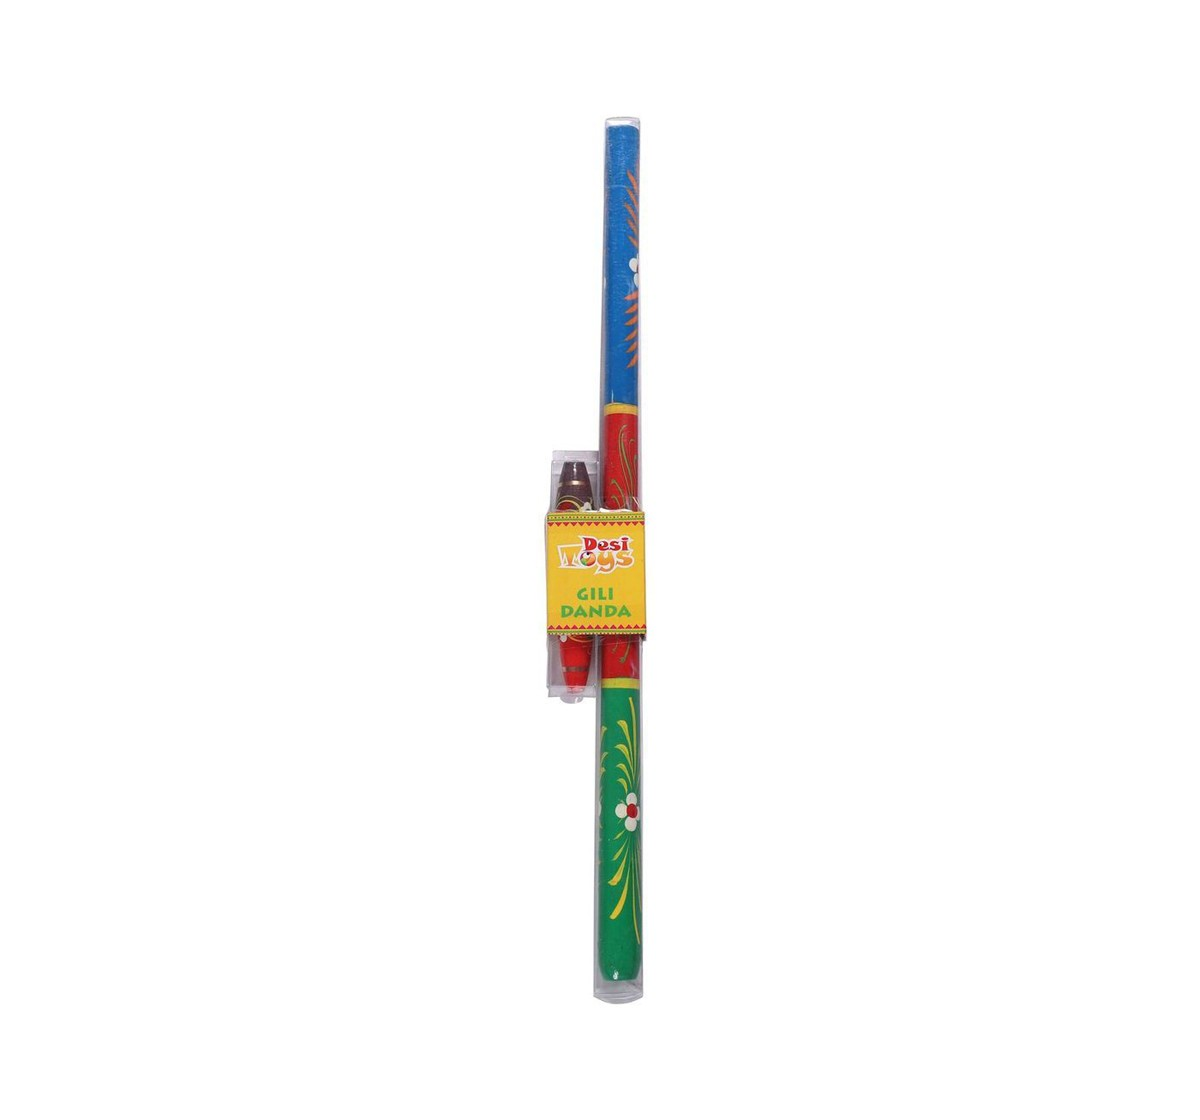 Desi Toys Gili Danda Game for Kids age 5Y+